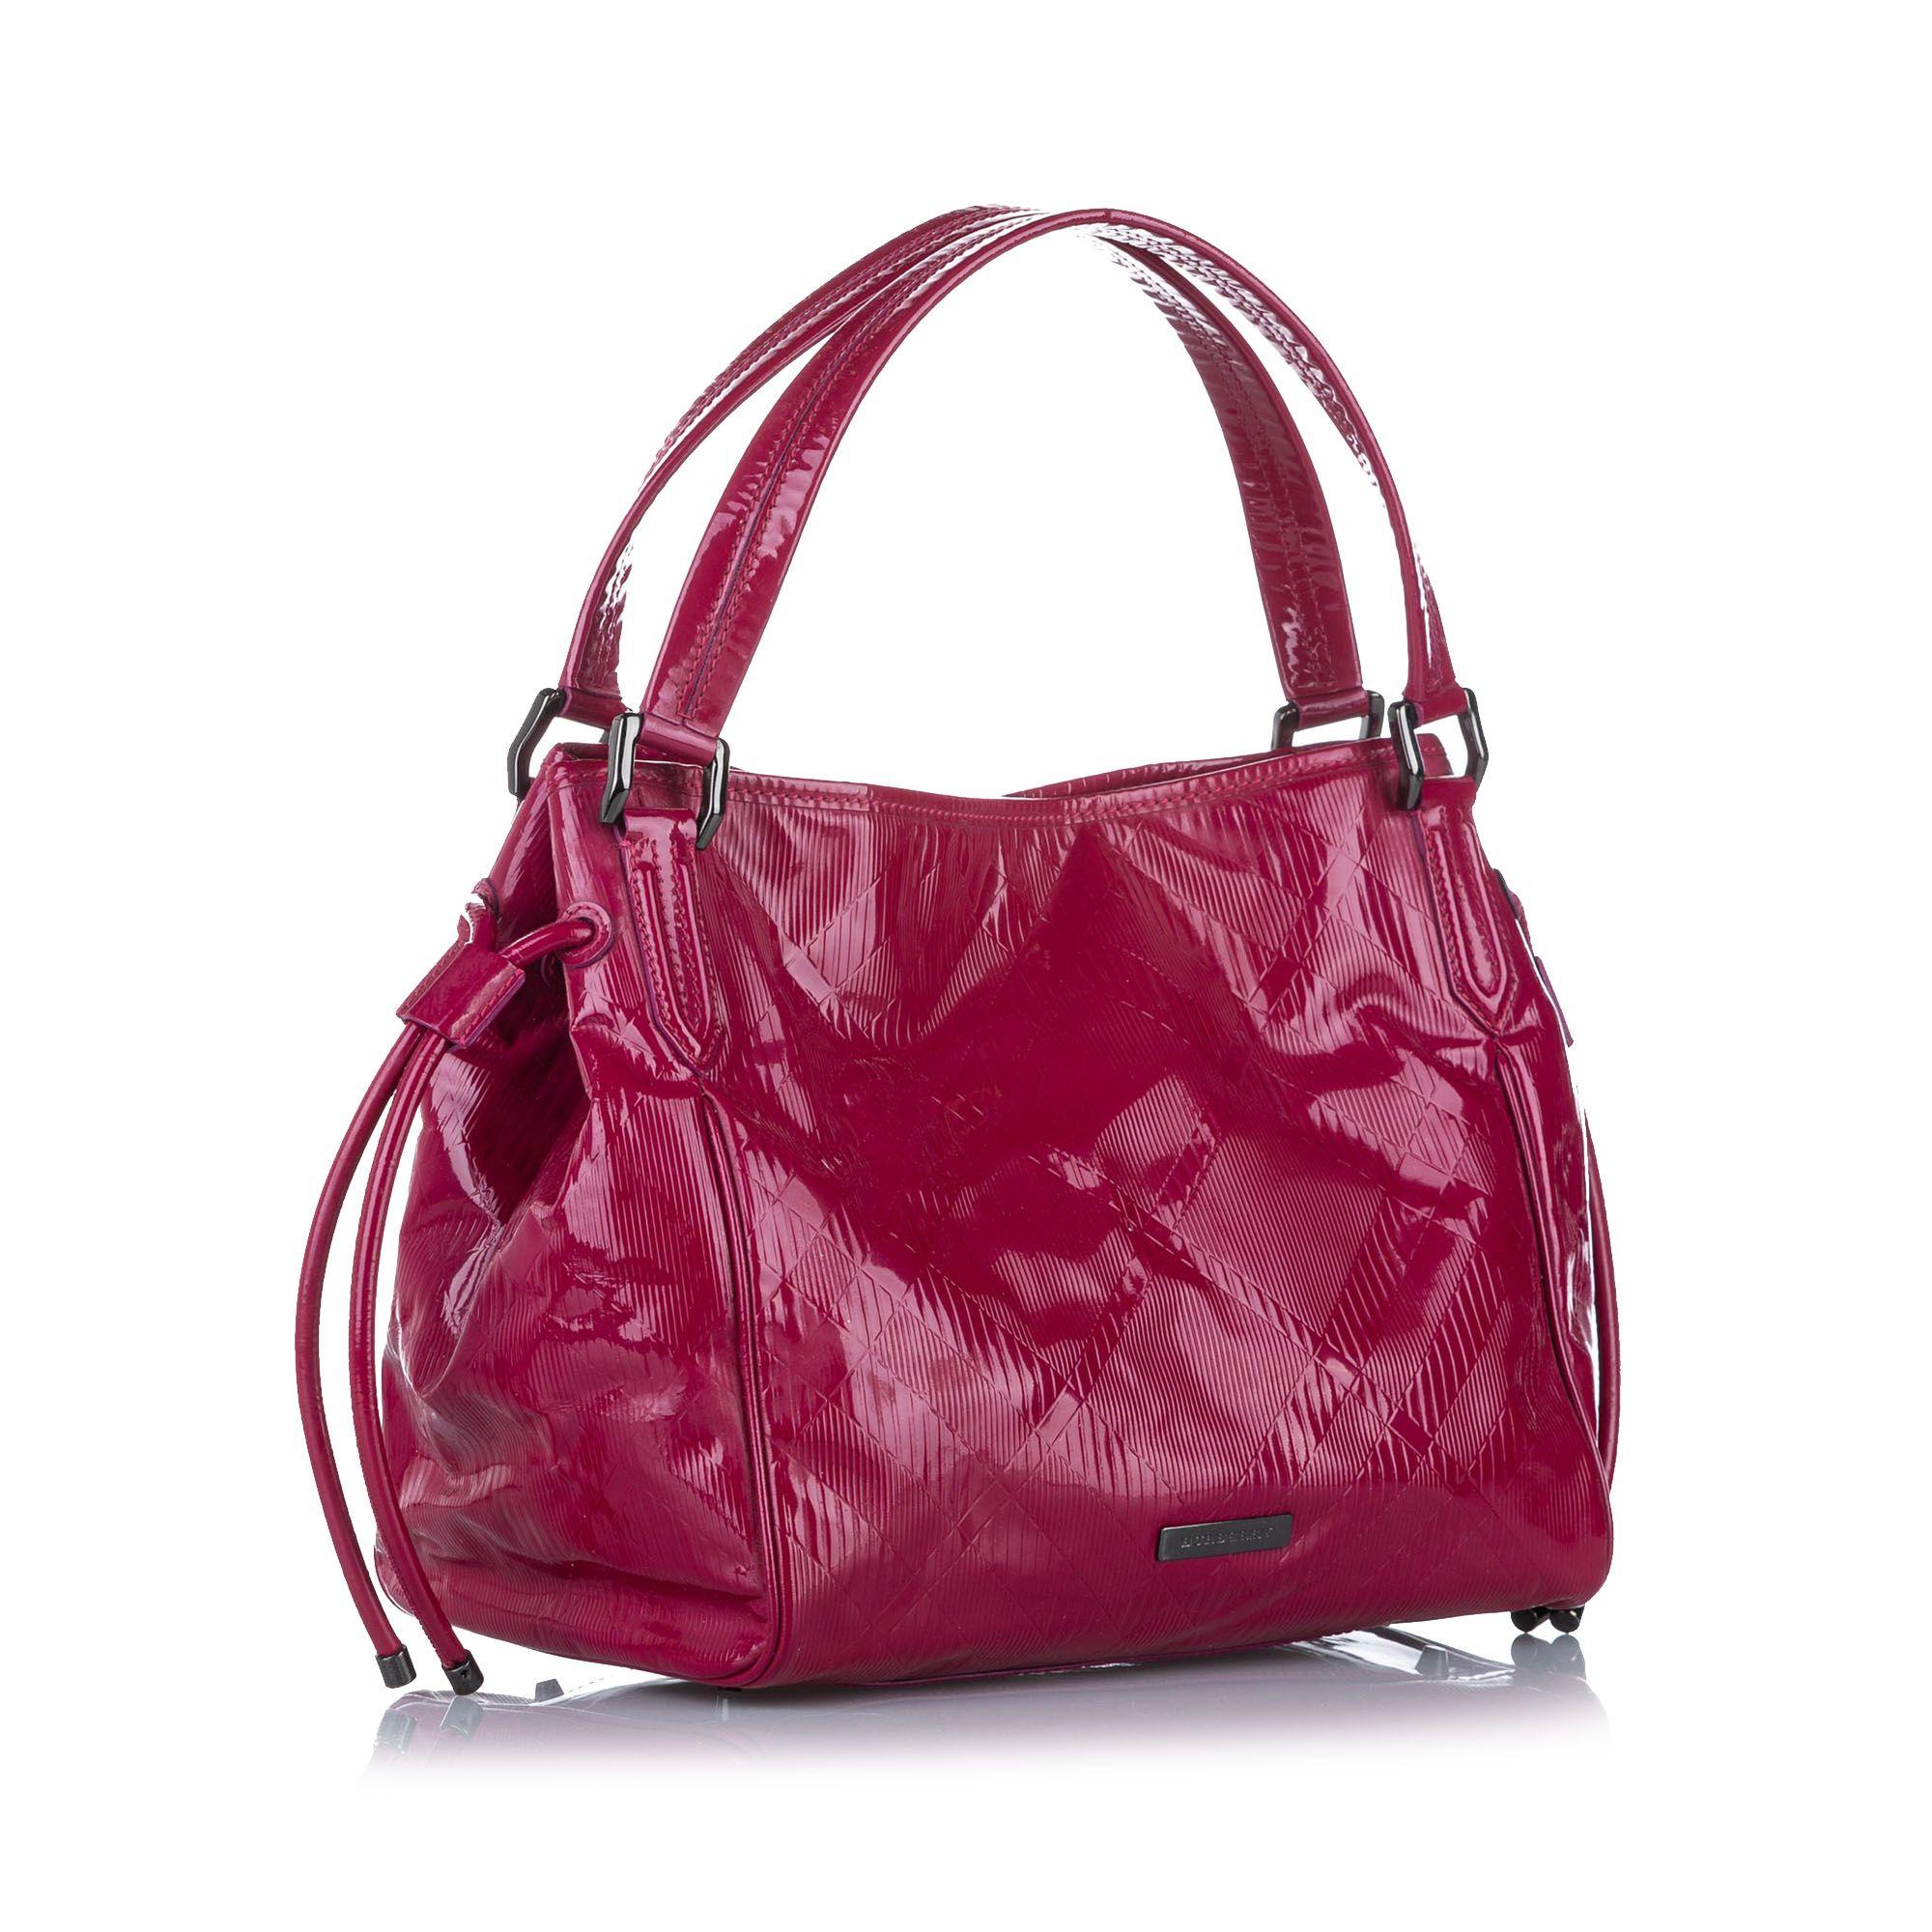 Vintage Burberry Bilmore Patent Leather Tote Bag Pink